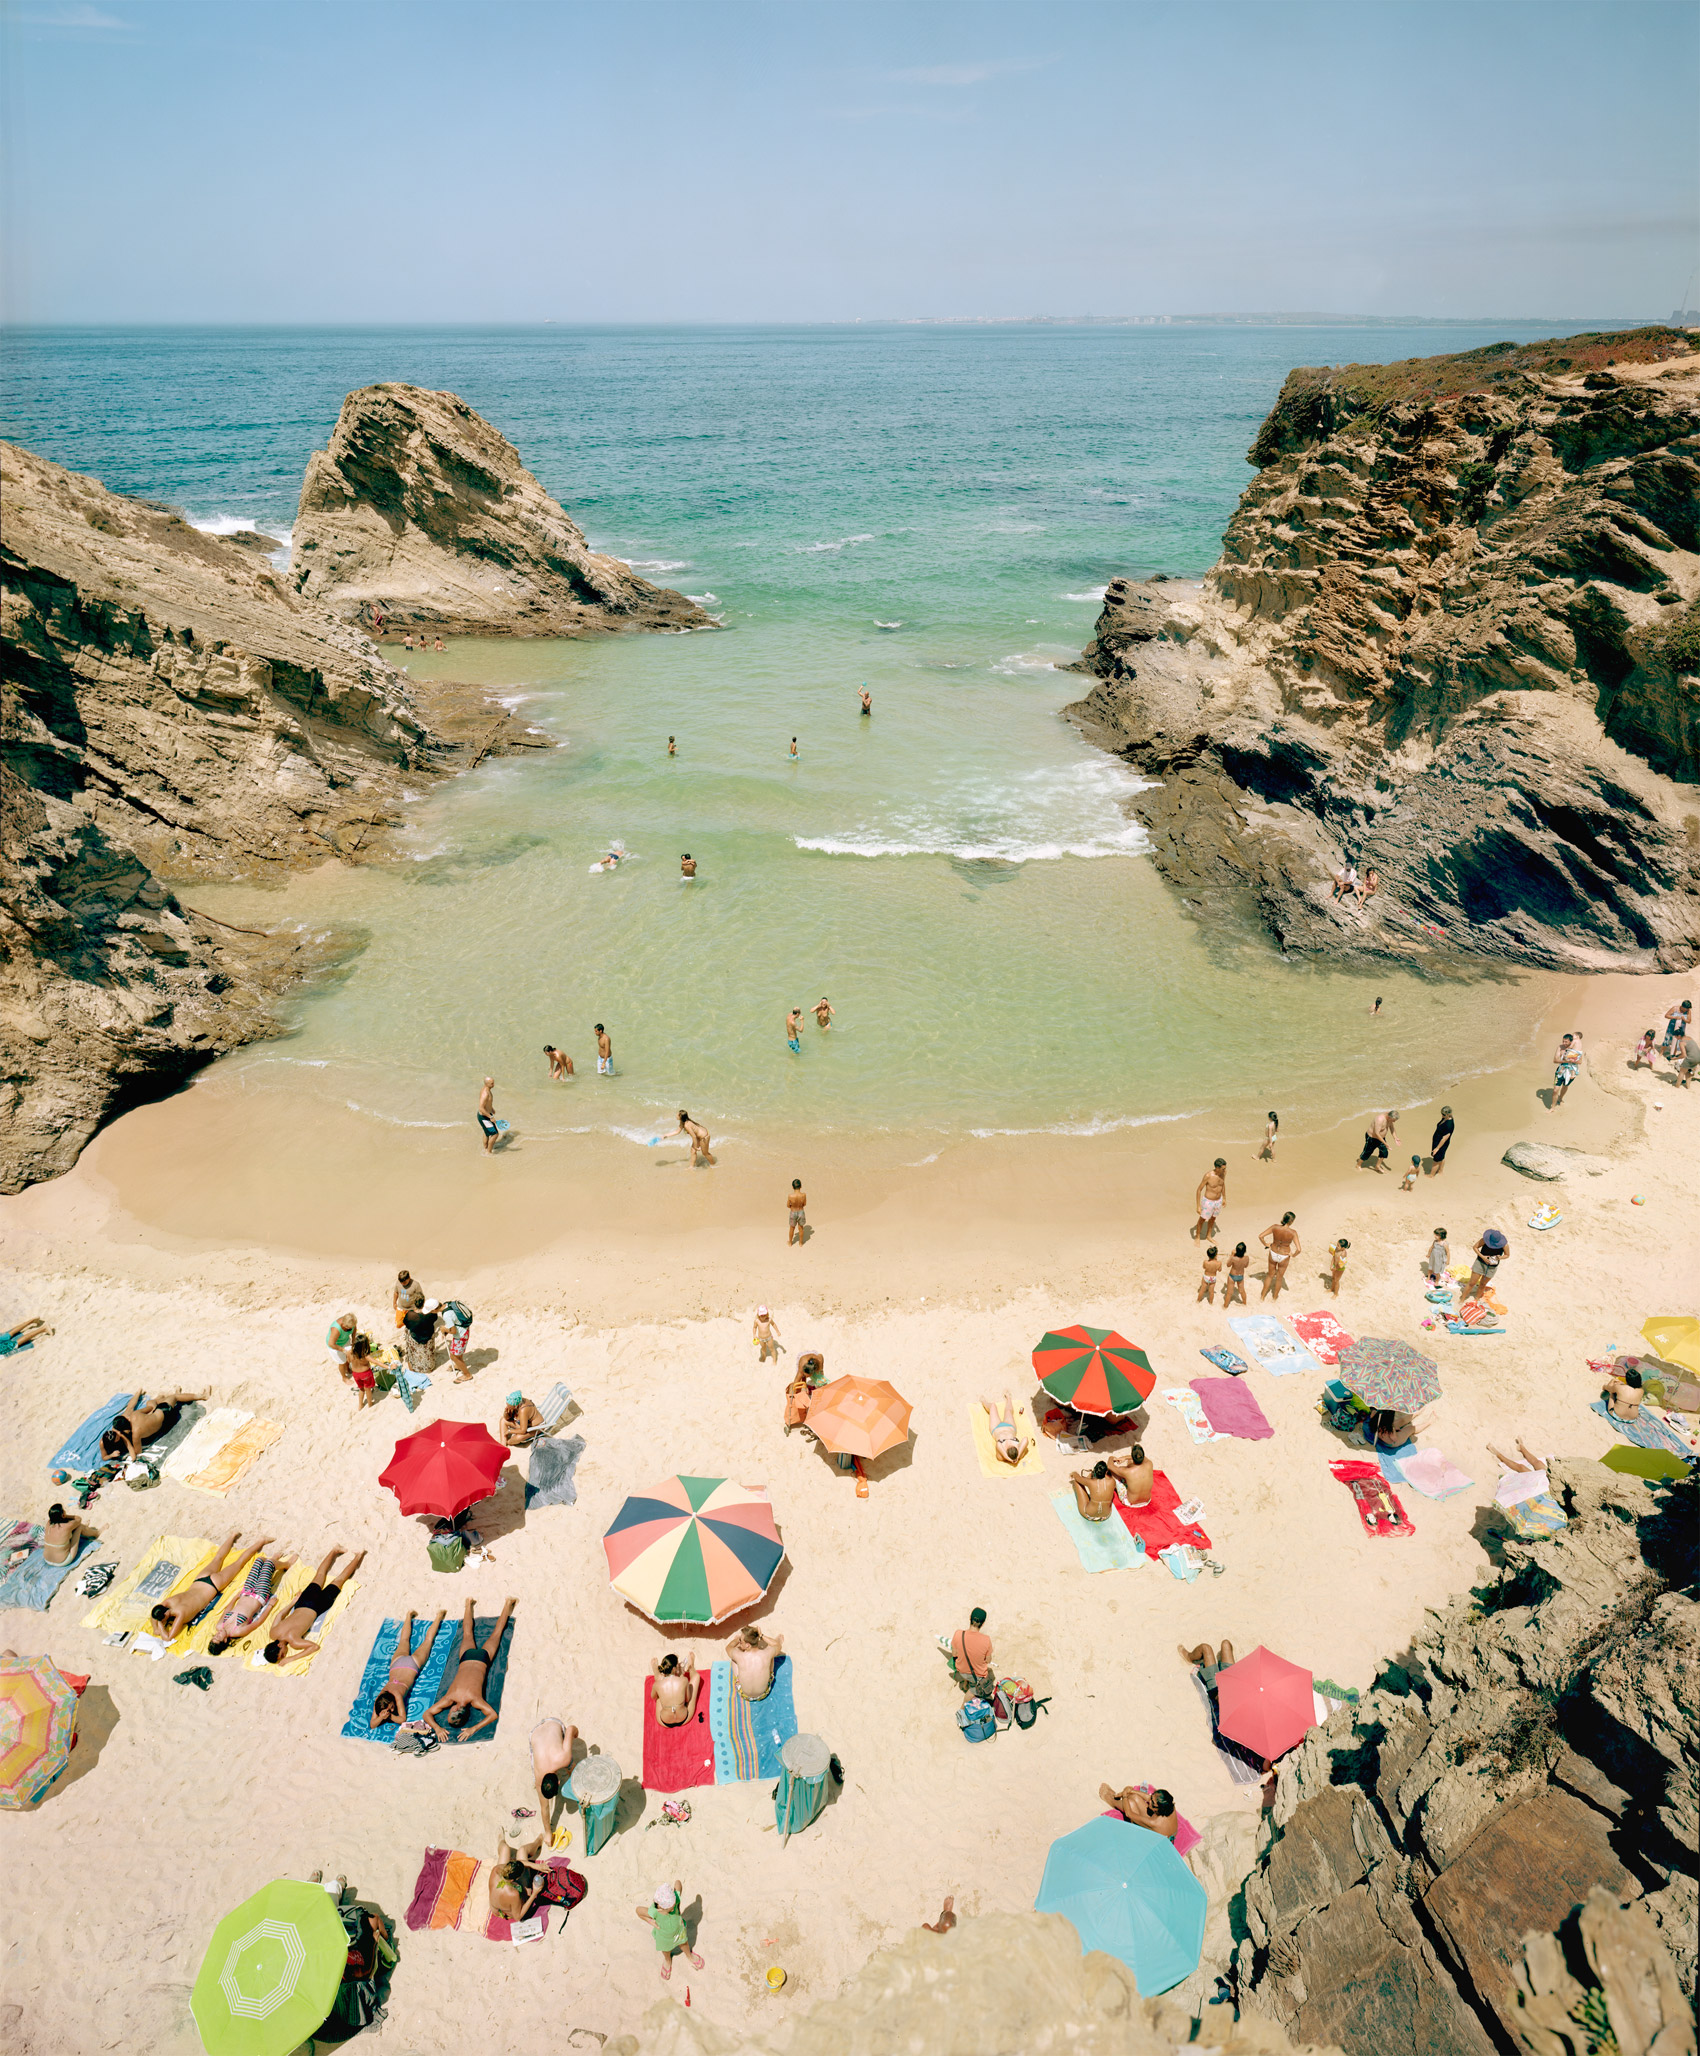 Praia-Piquinia-10-08-11-13h21-BIG.jpg